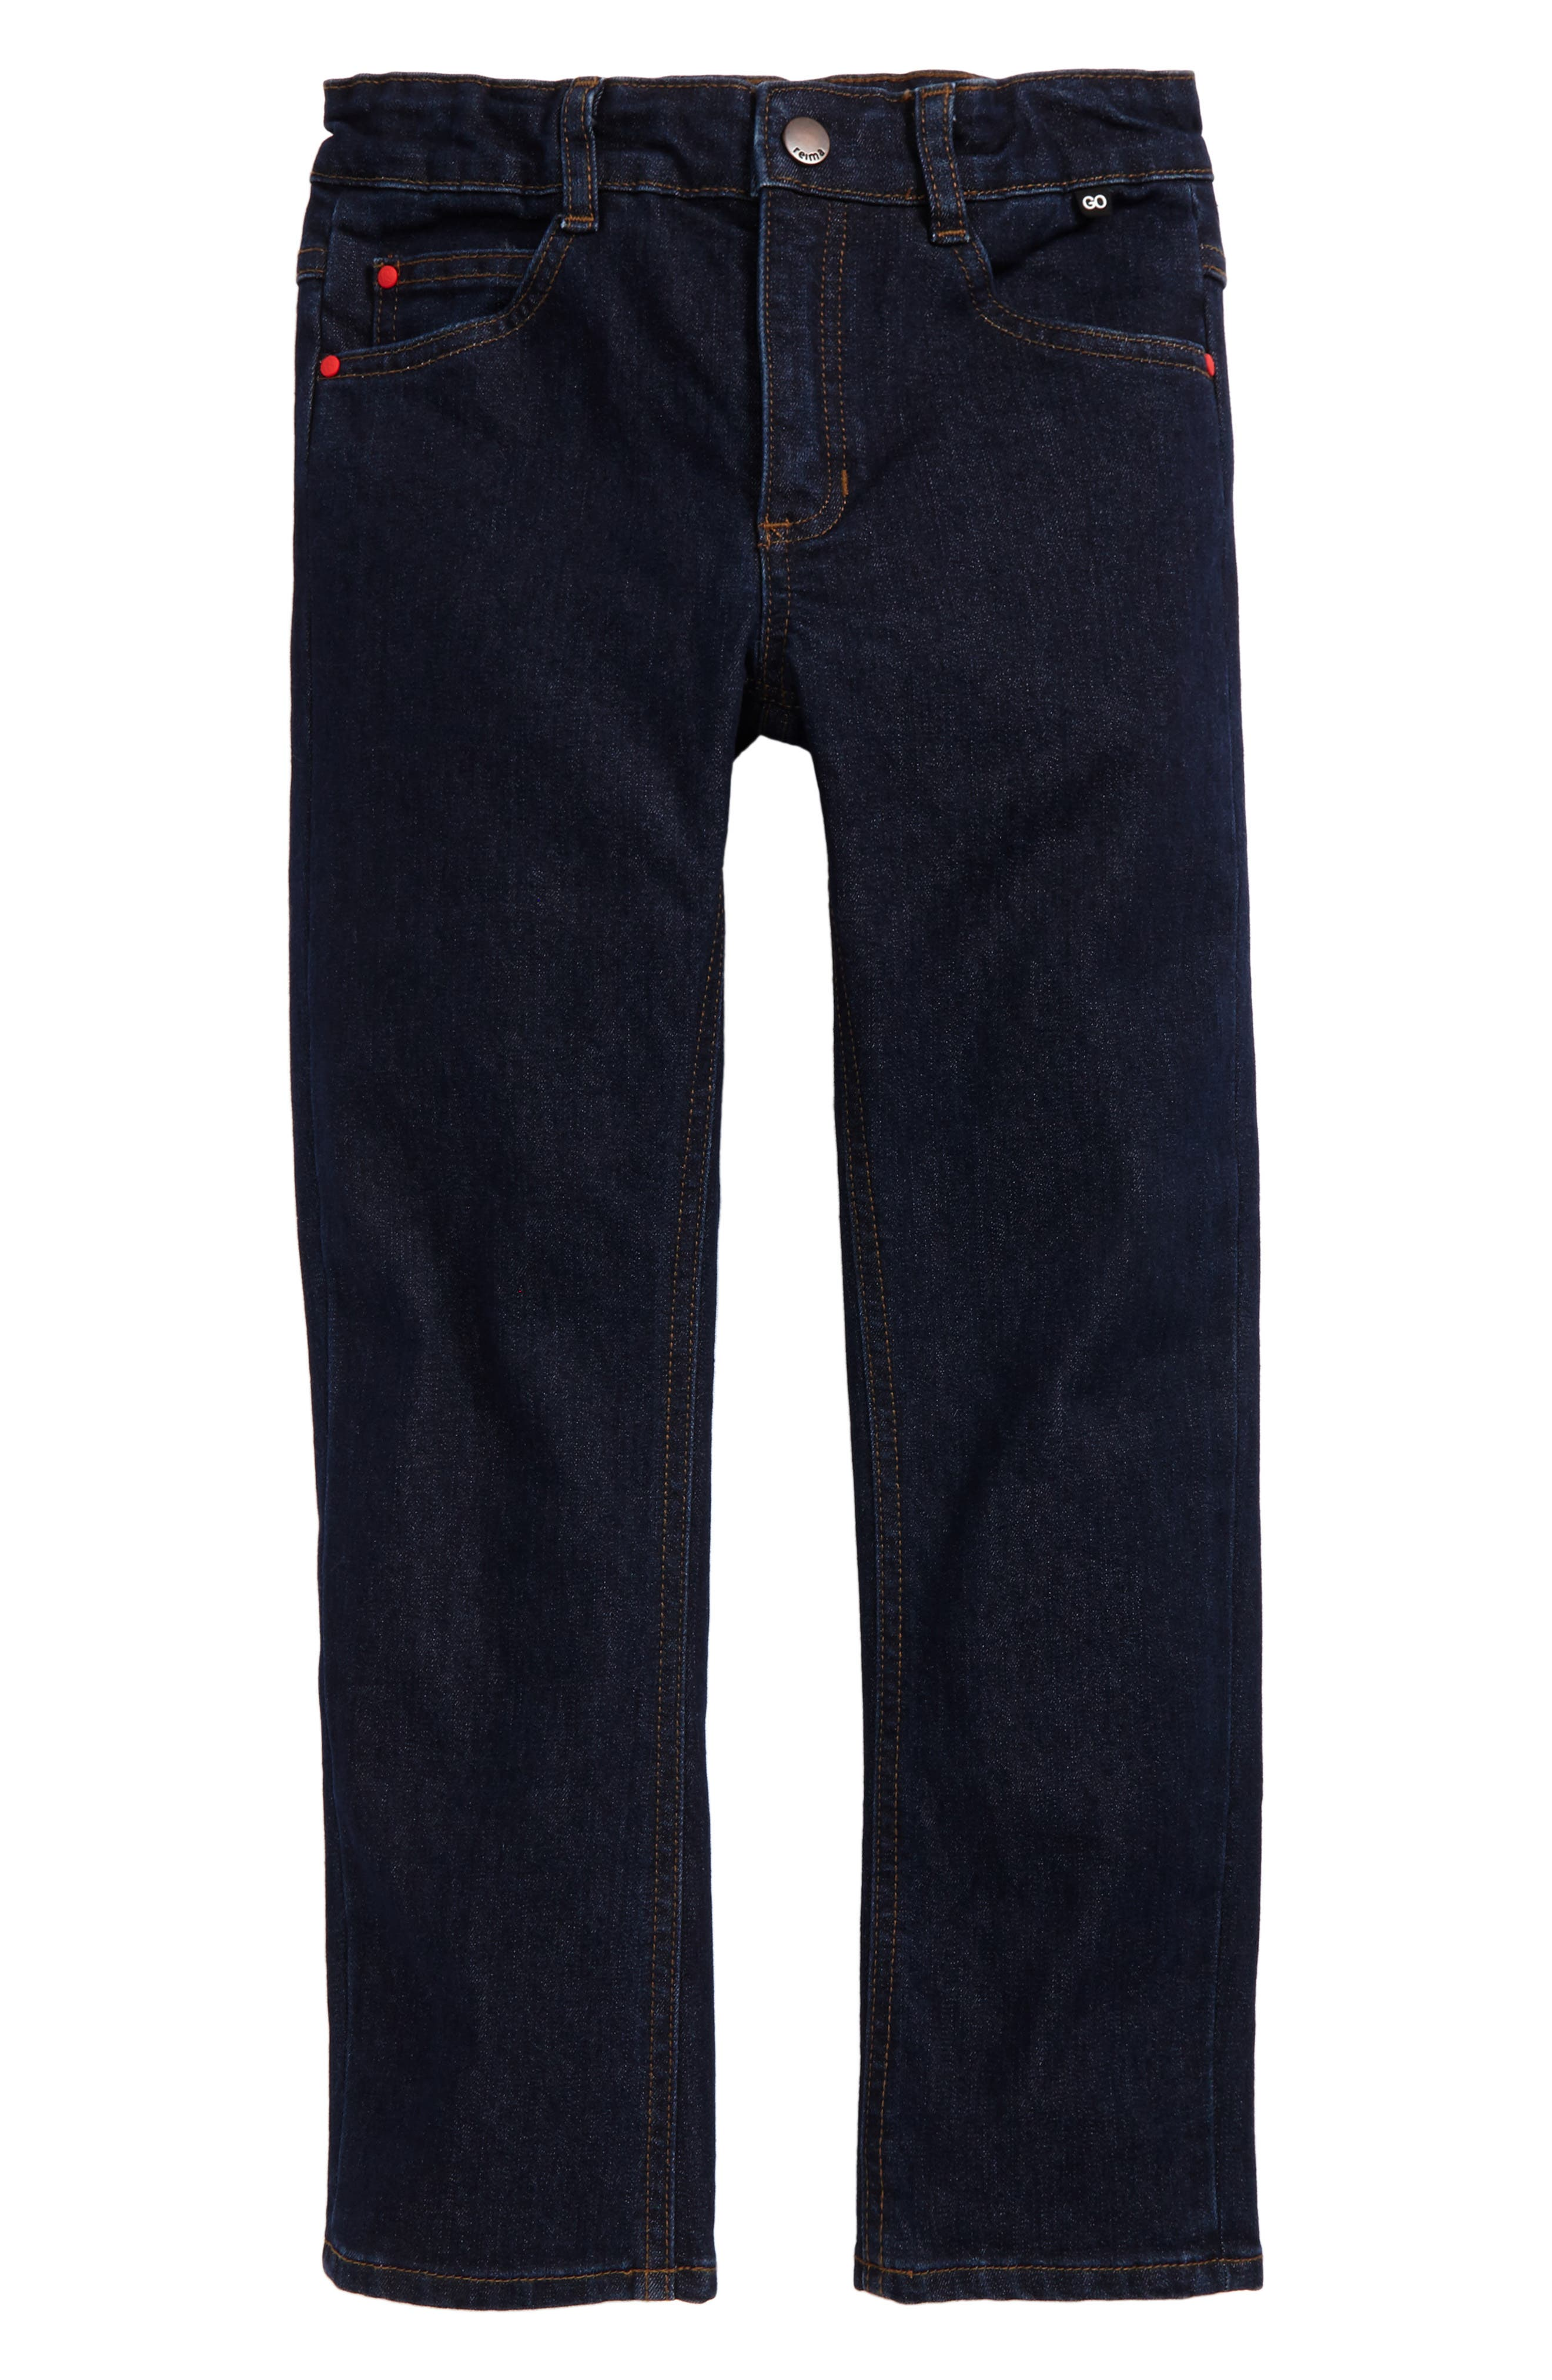 Alternate Image 1 Selected - Reima Trick Straight Leg Jeans (Big Boys)